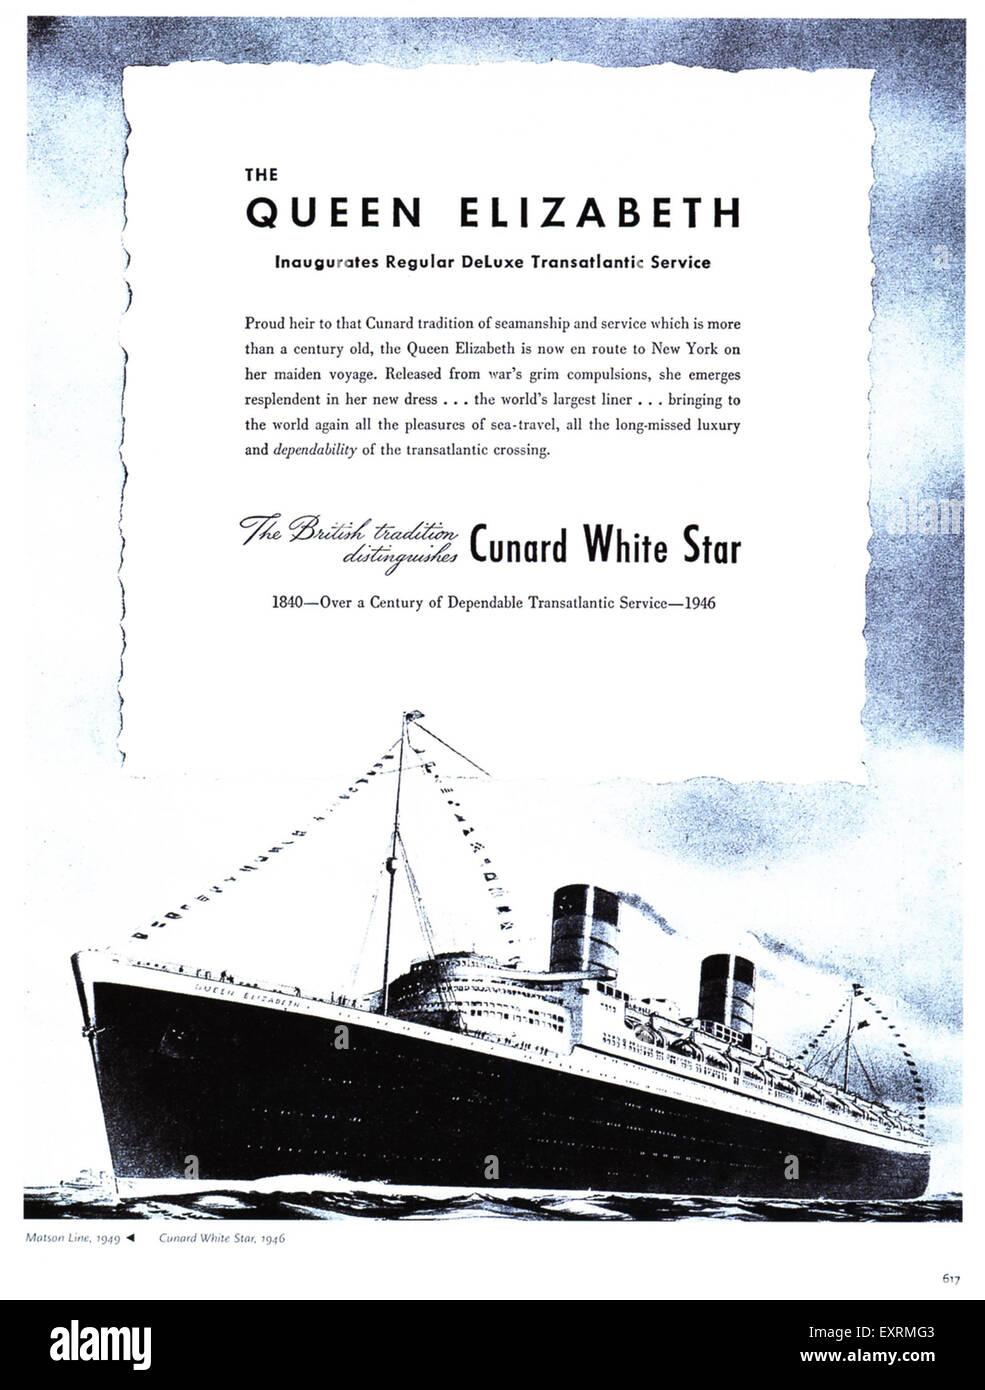 Cunard Magazine Advert - Stock Image